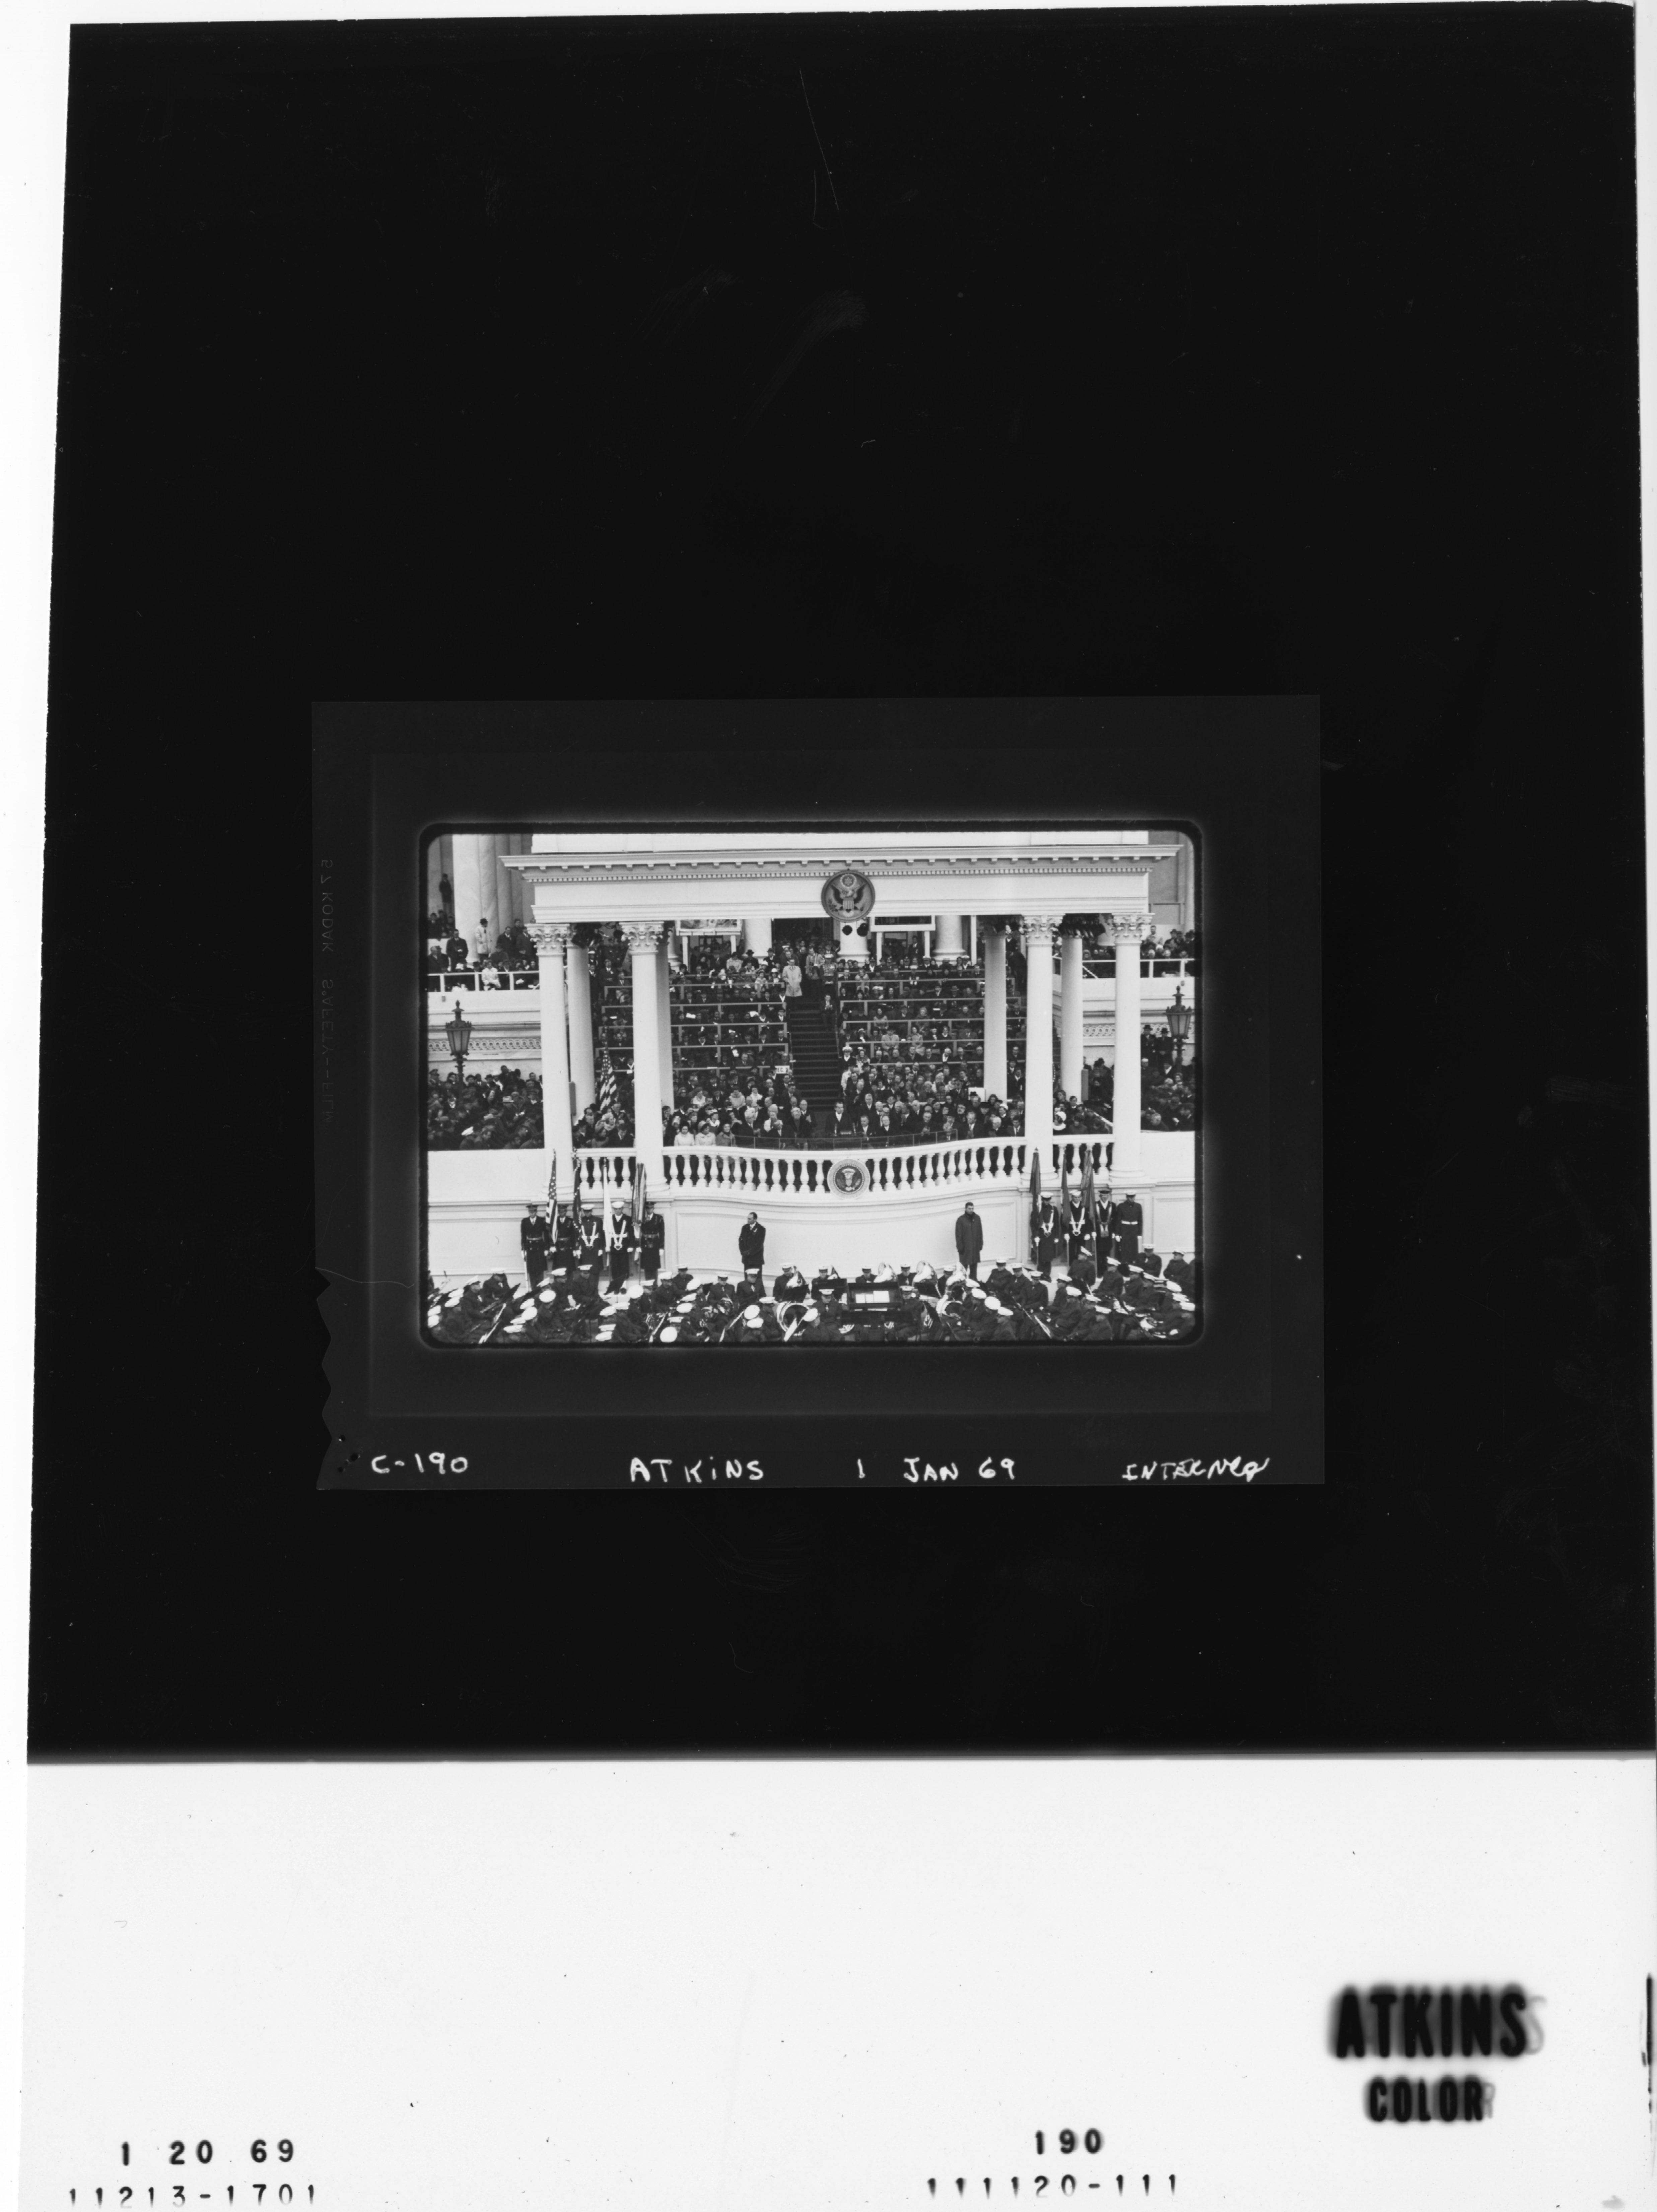 WHITE HOUSE PHOTO OFFICE (WHPO) SELECTIONS THE RICHARD NIXON